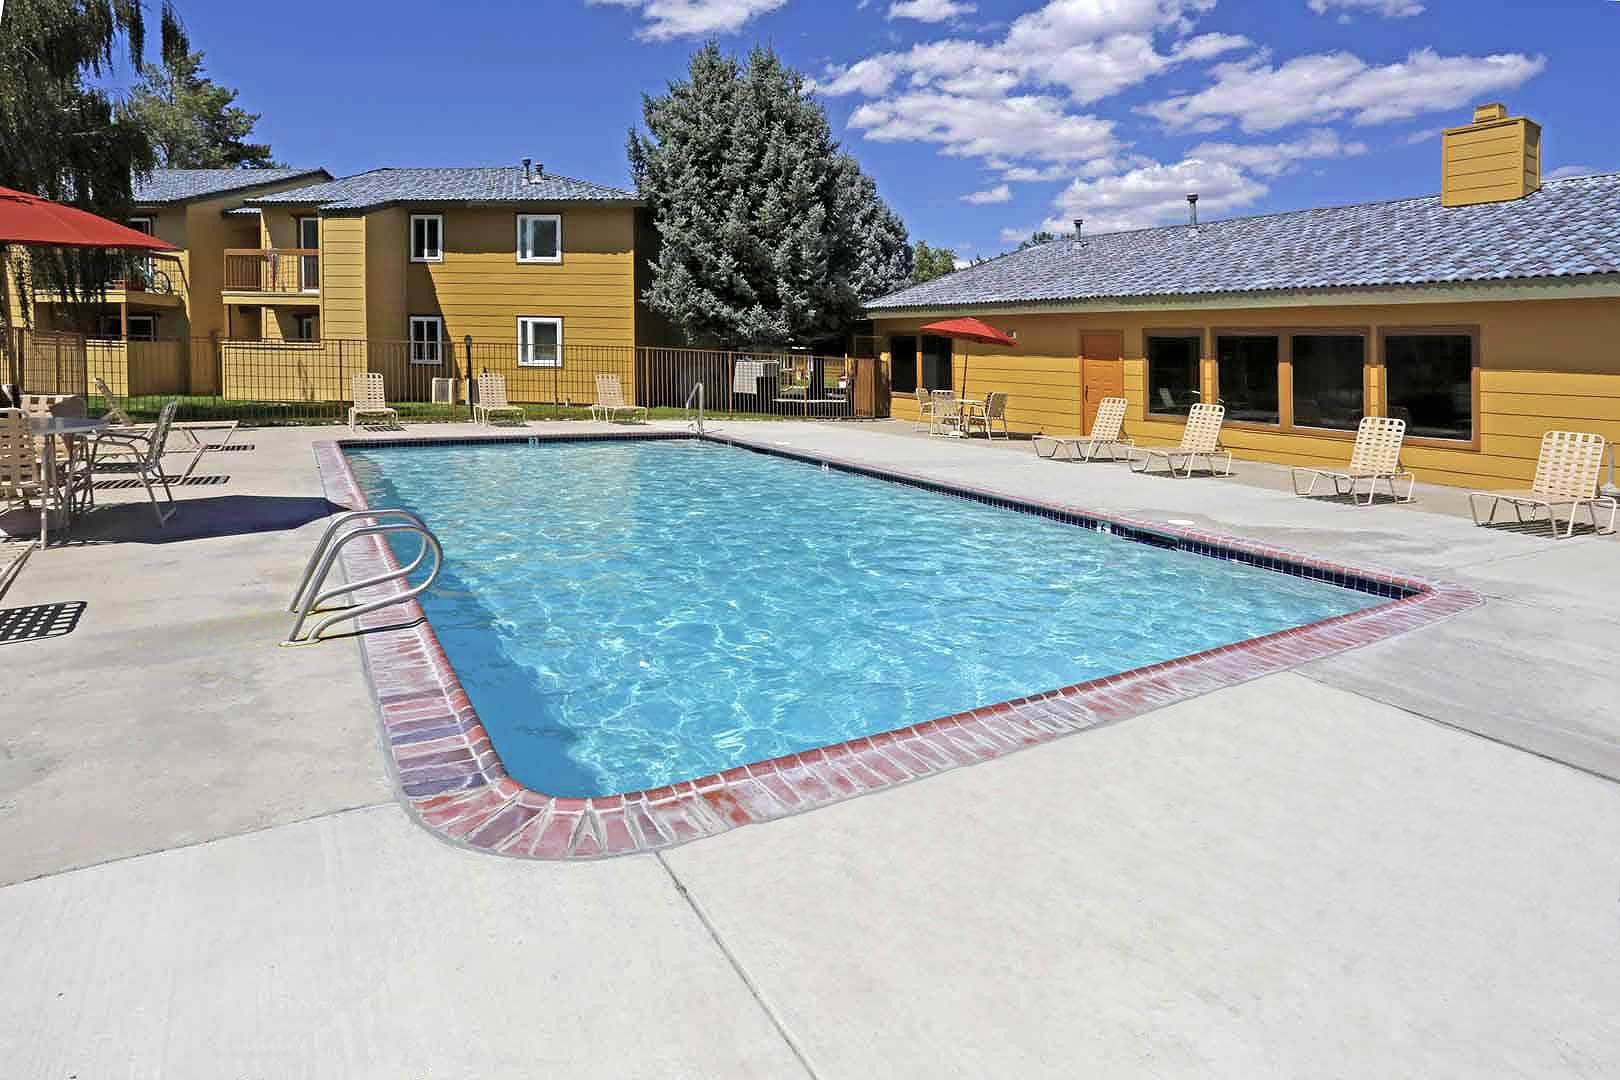 Apartments in South Reno, NV near Lake Tahoe